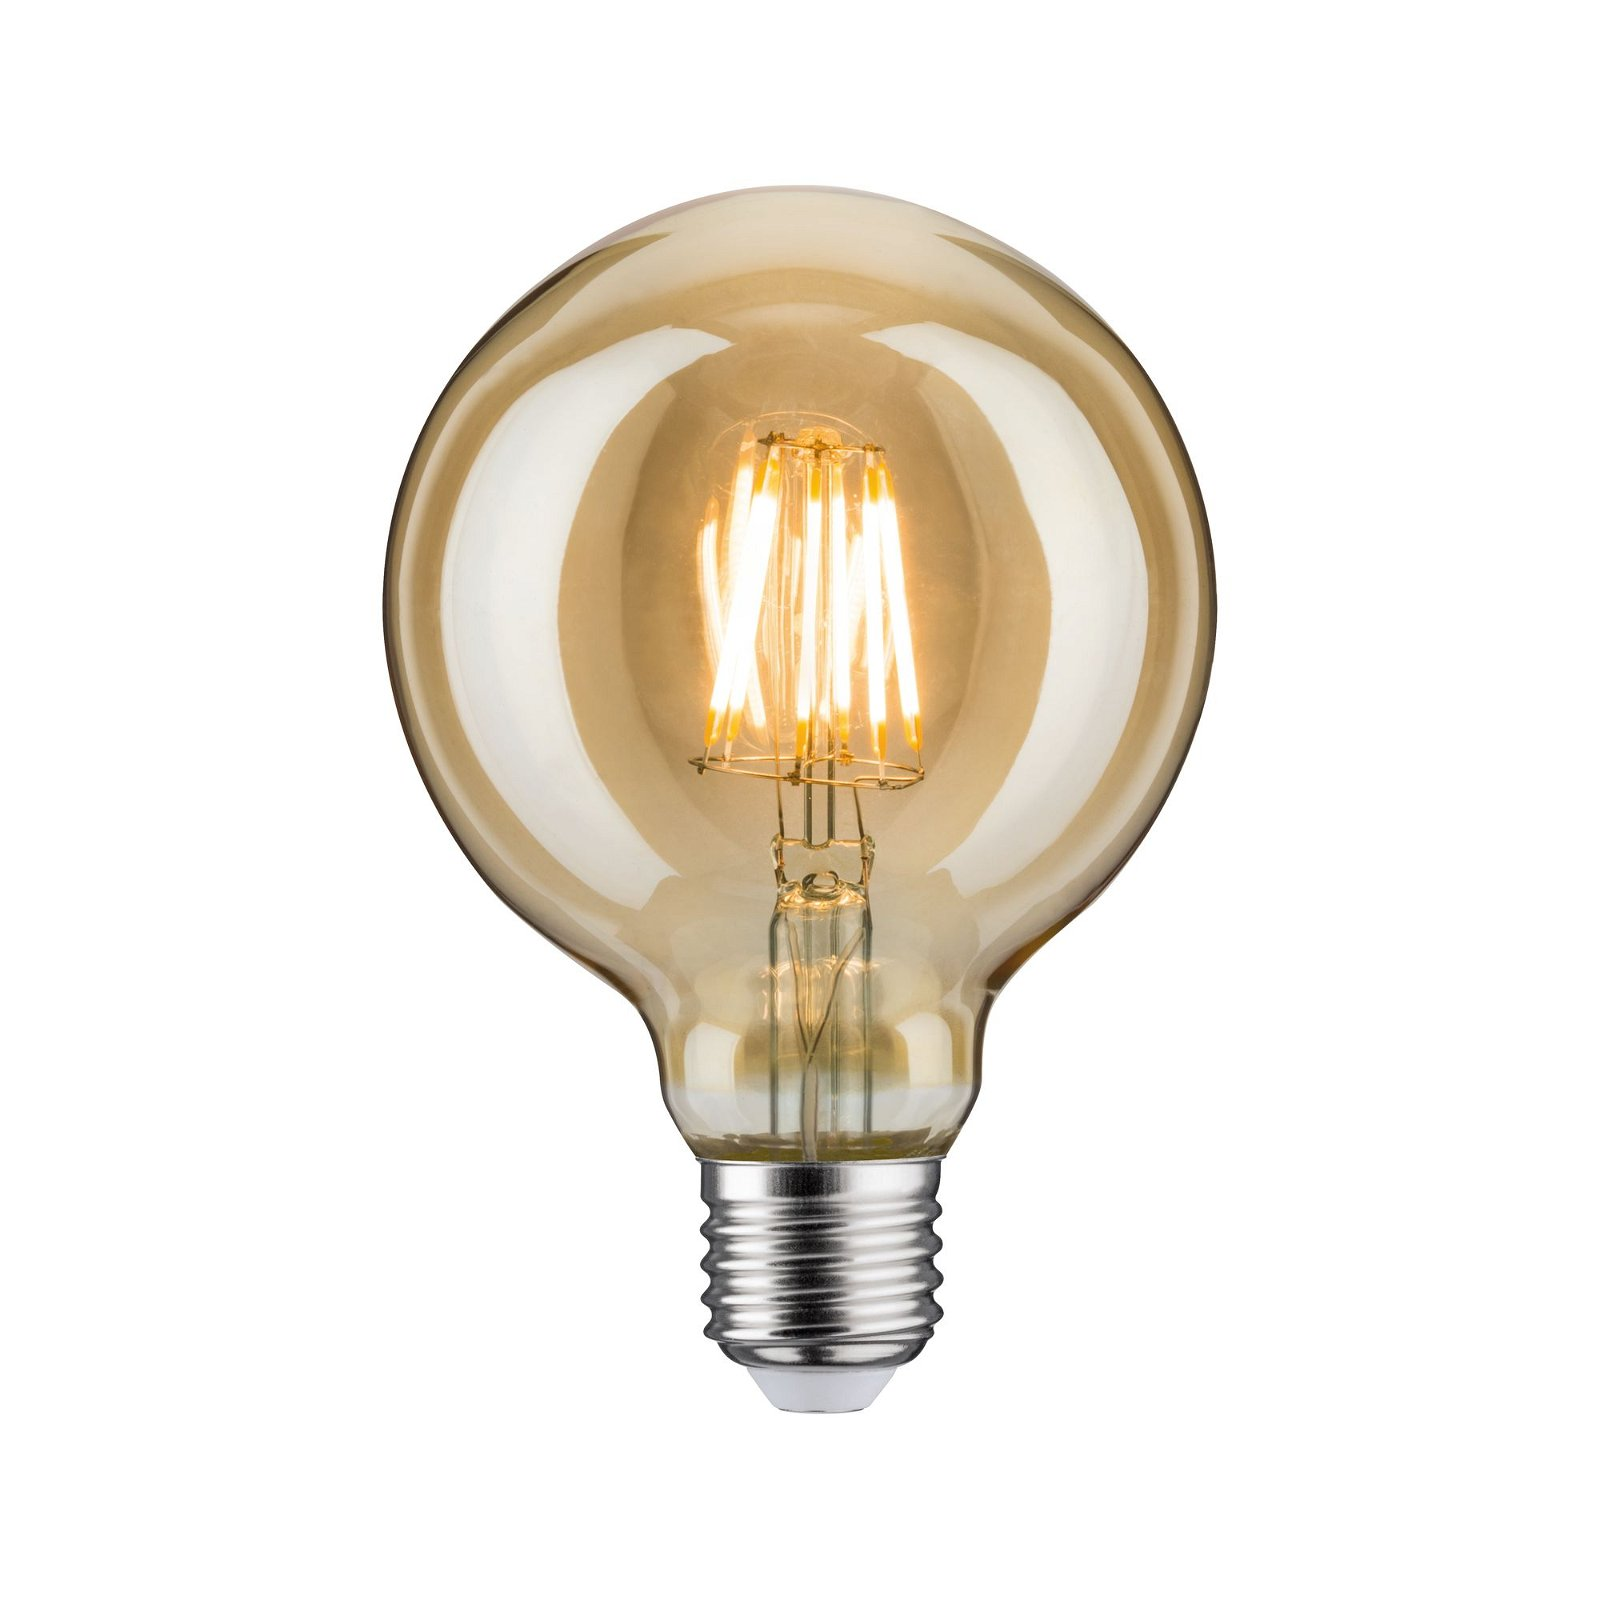 LED Globe E27 230V 680lm 6,5W 2500K Gold